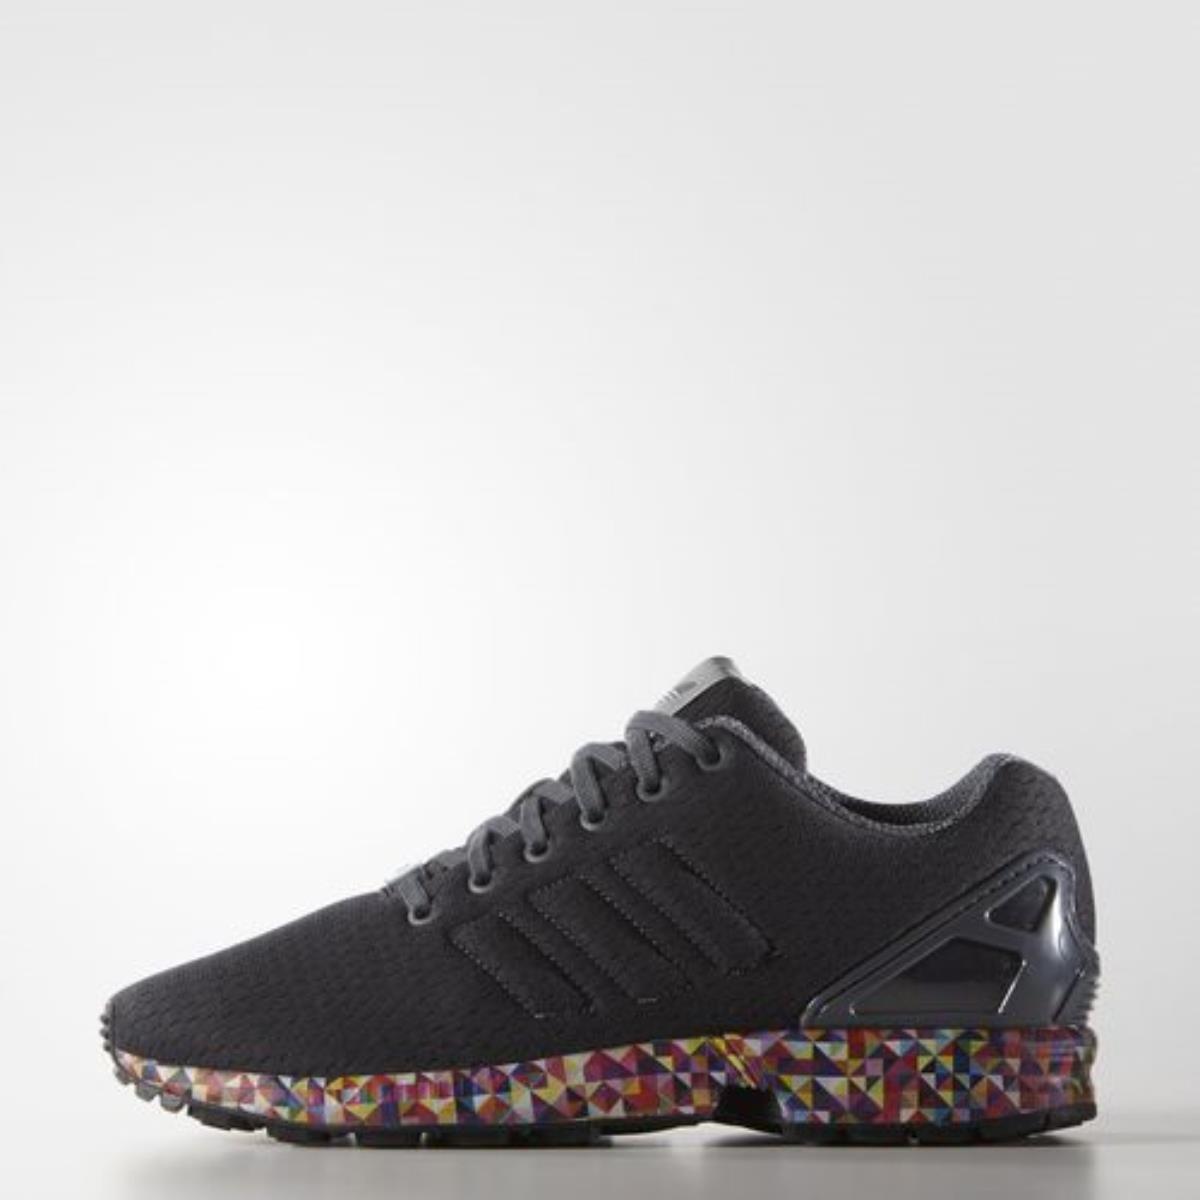 Adidas Originals ZX Flux AF6306